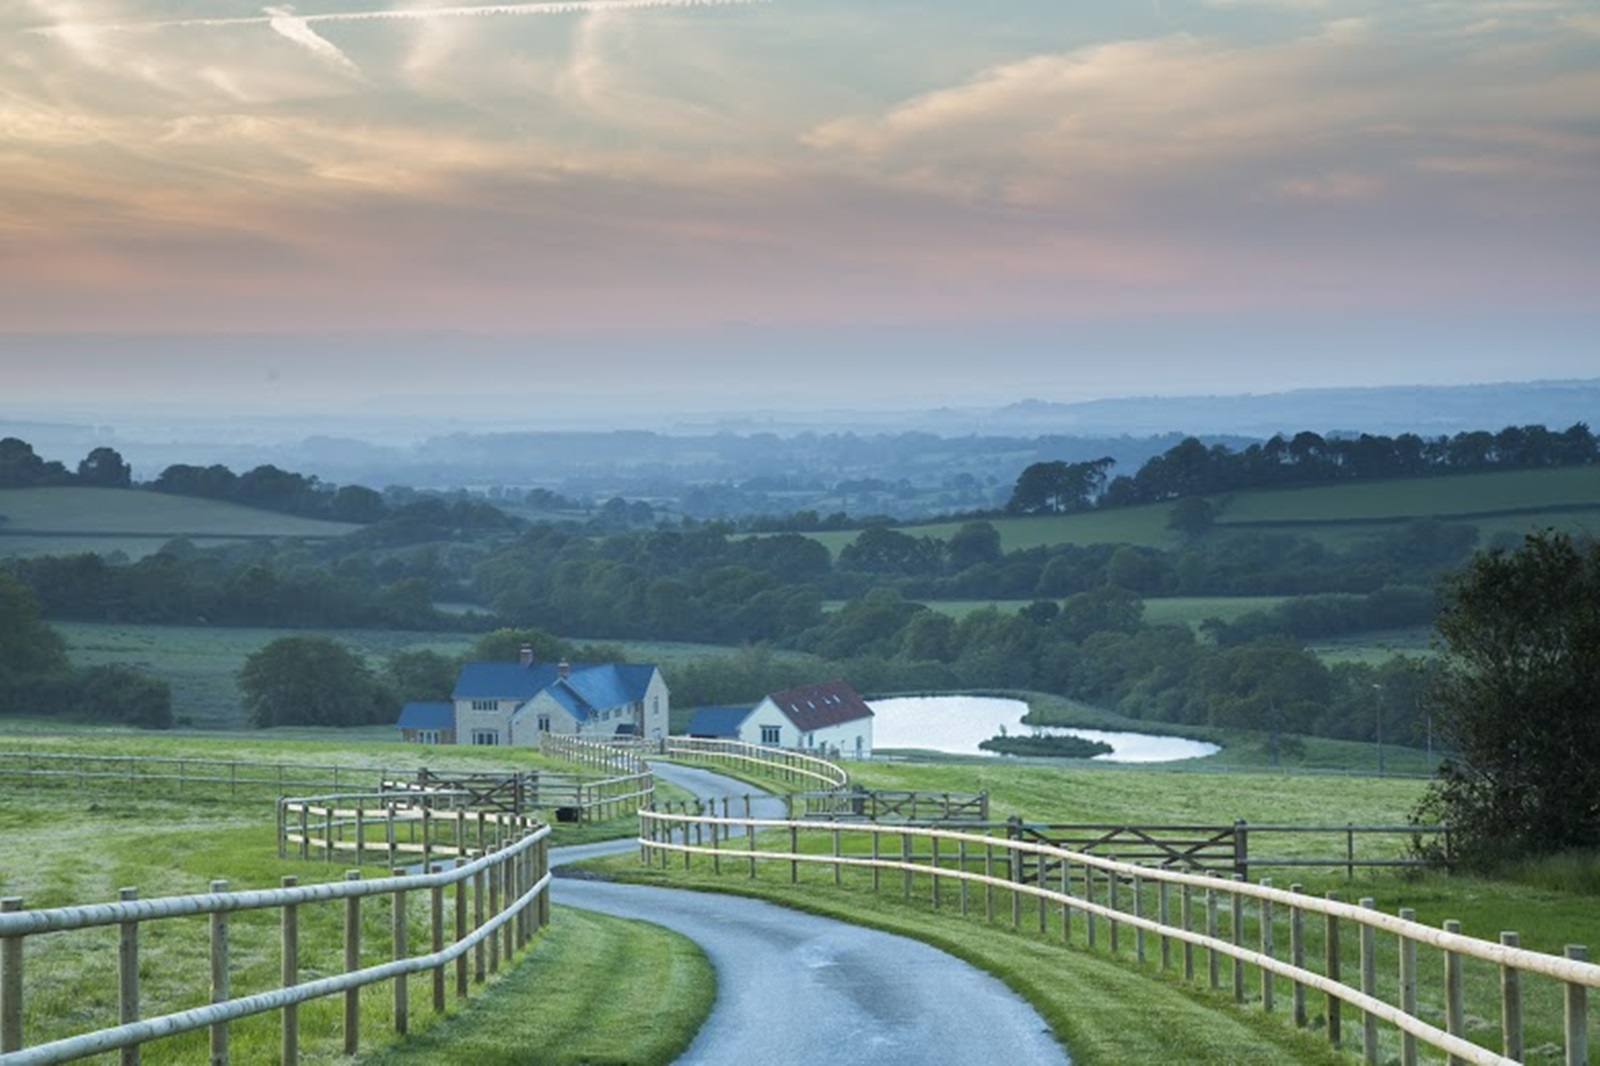 Wellwood Farm, West Dorset